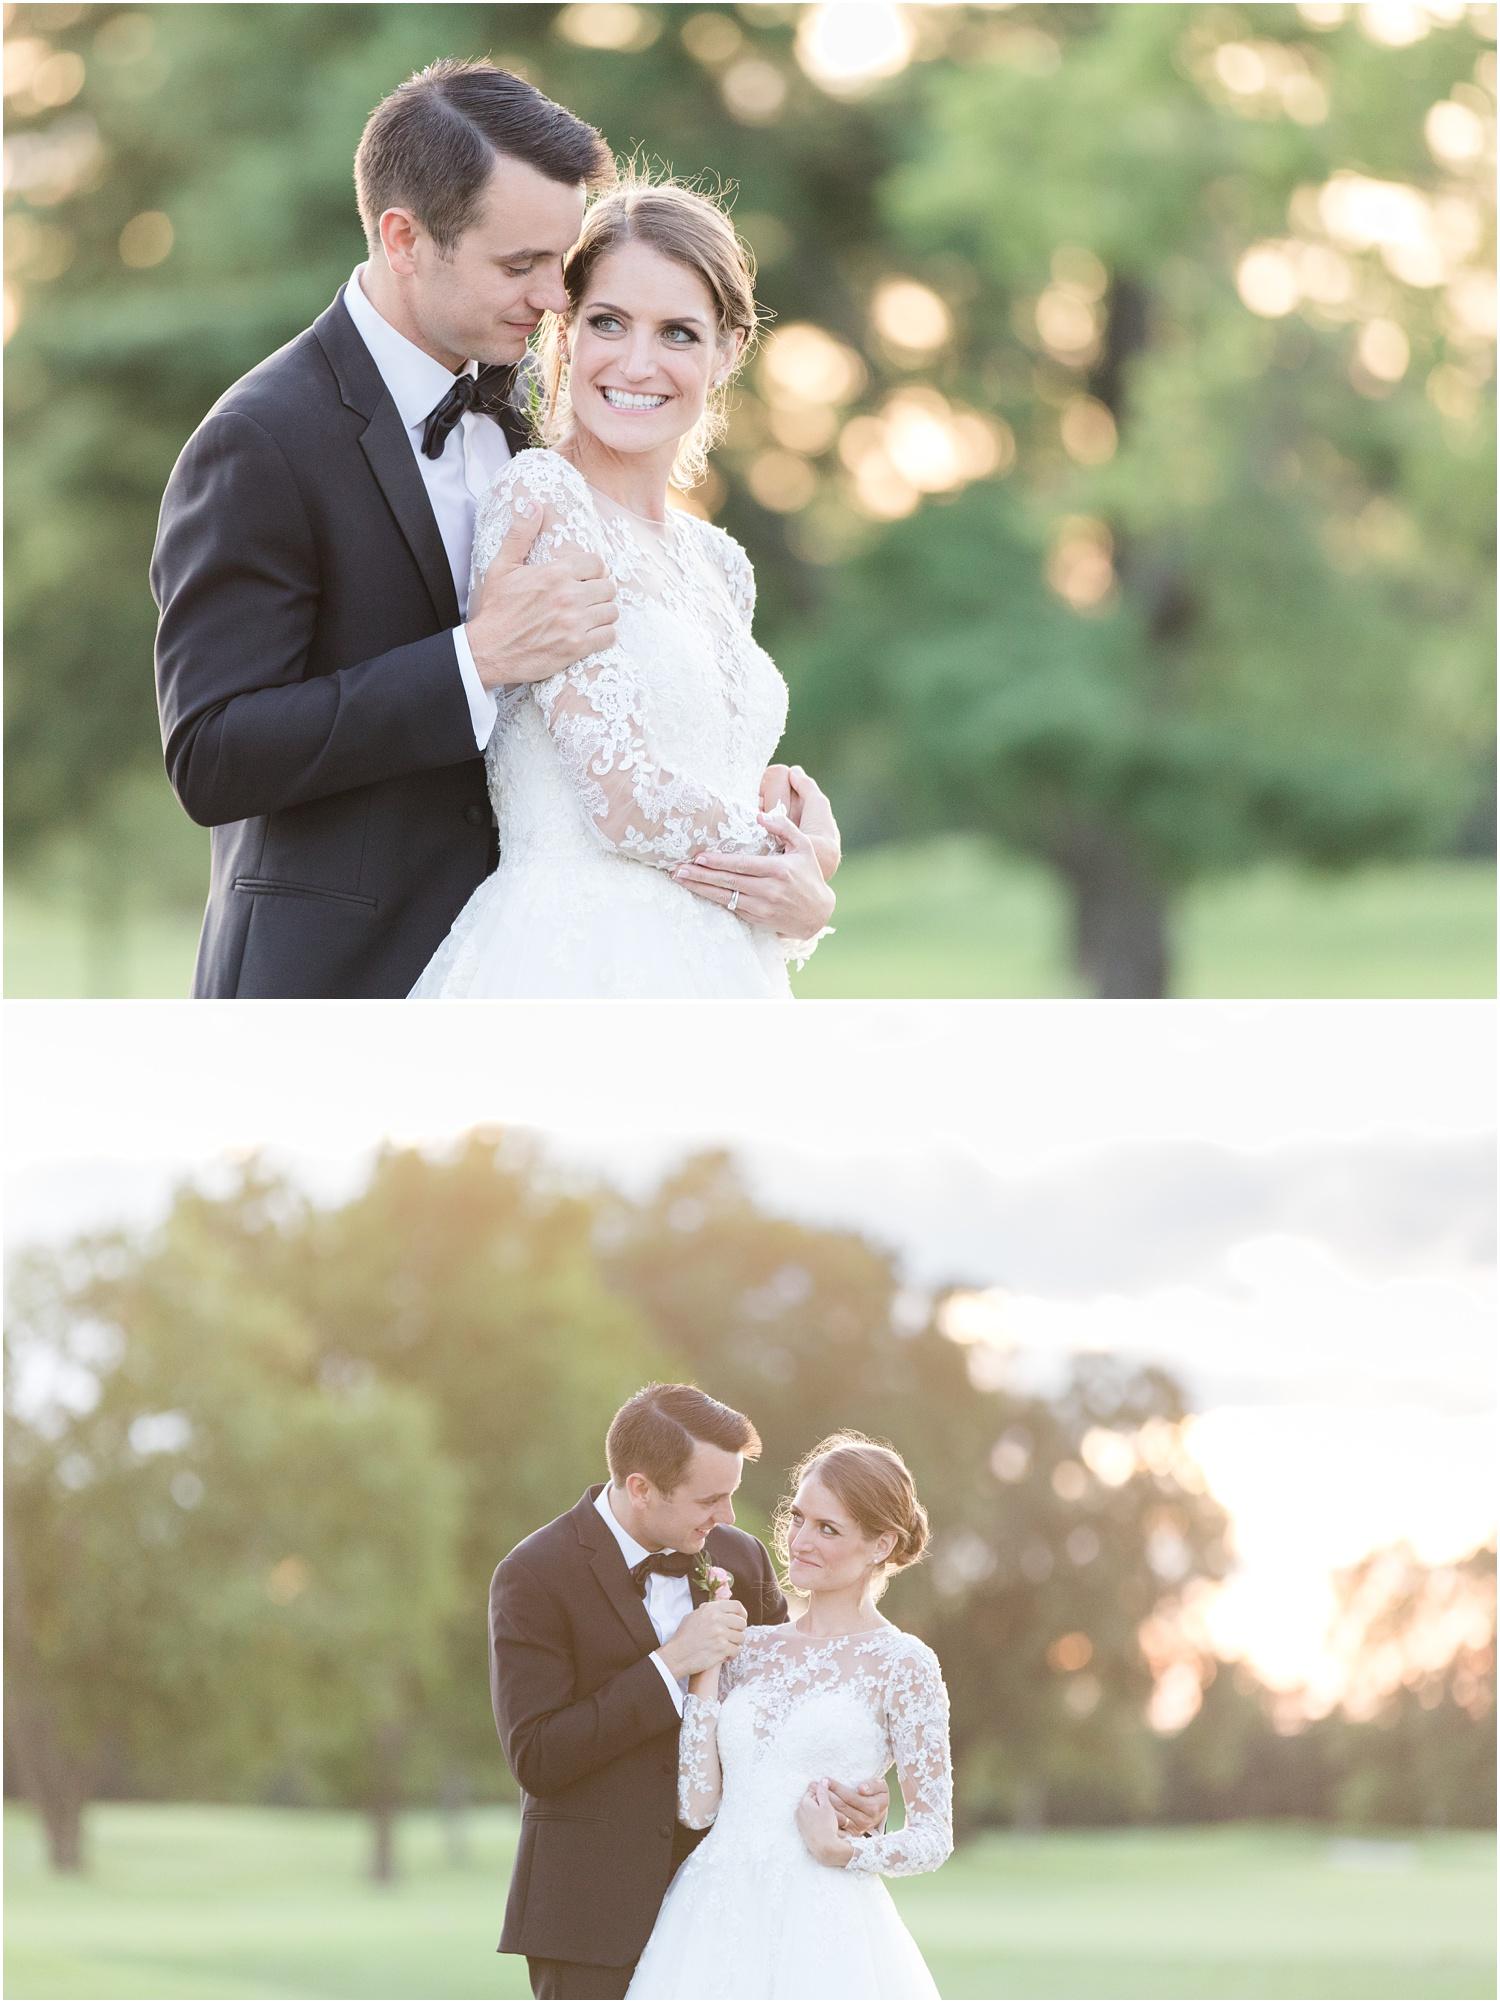 Romantic Sunset wedding photos at Canoe Brook Country Club